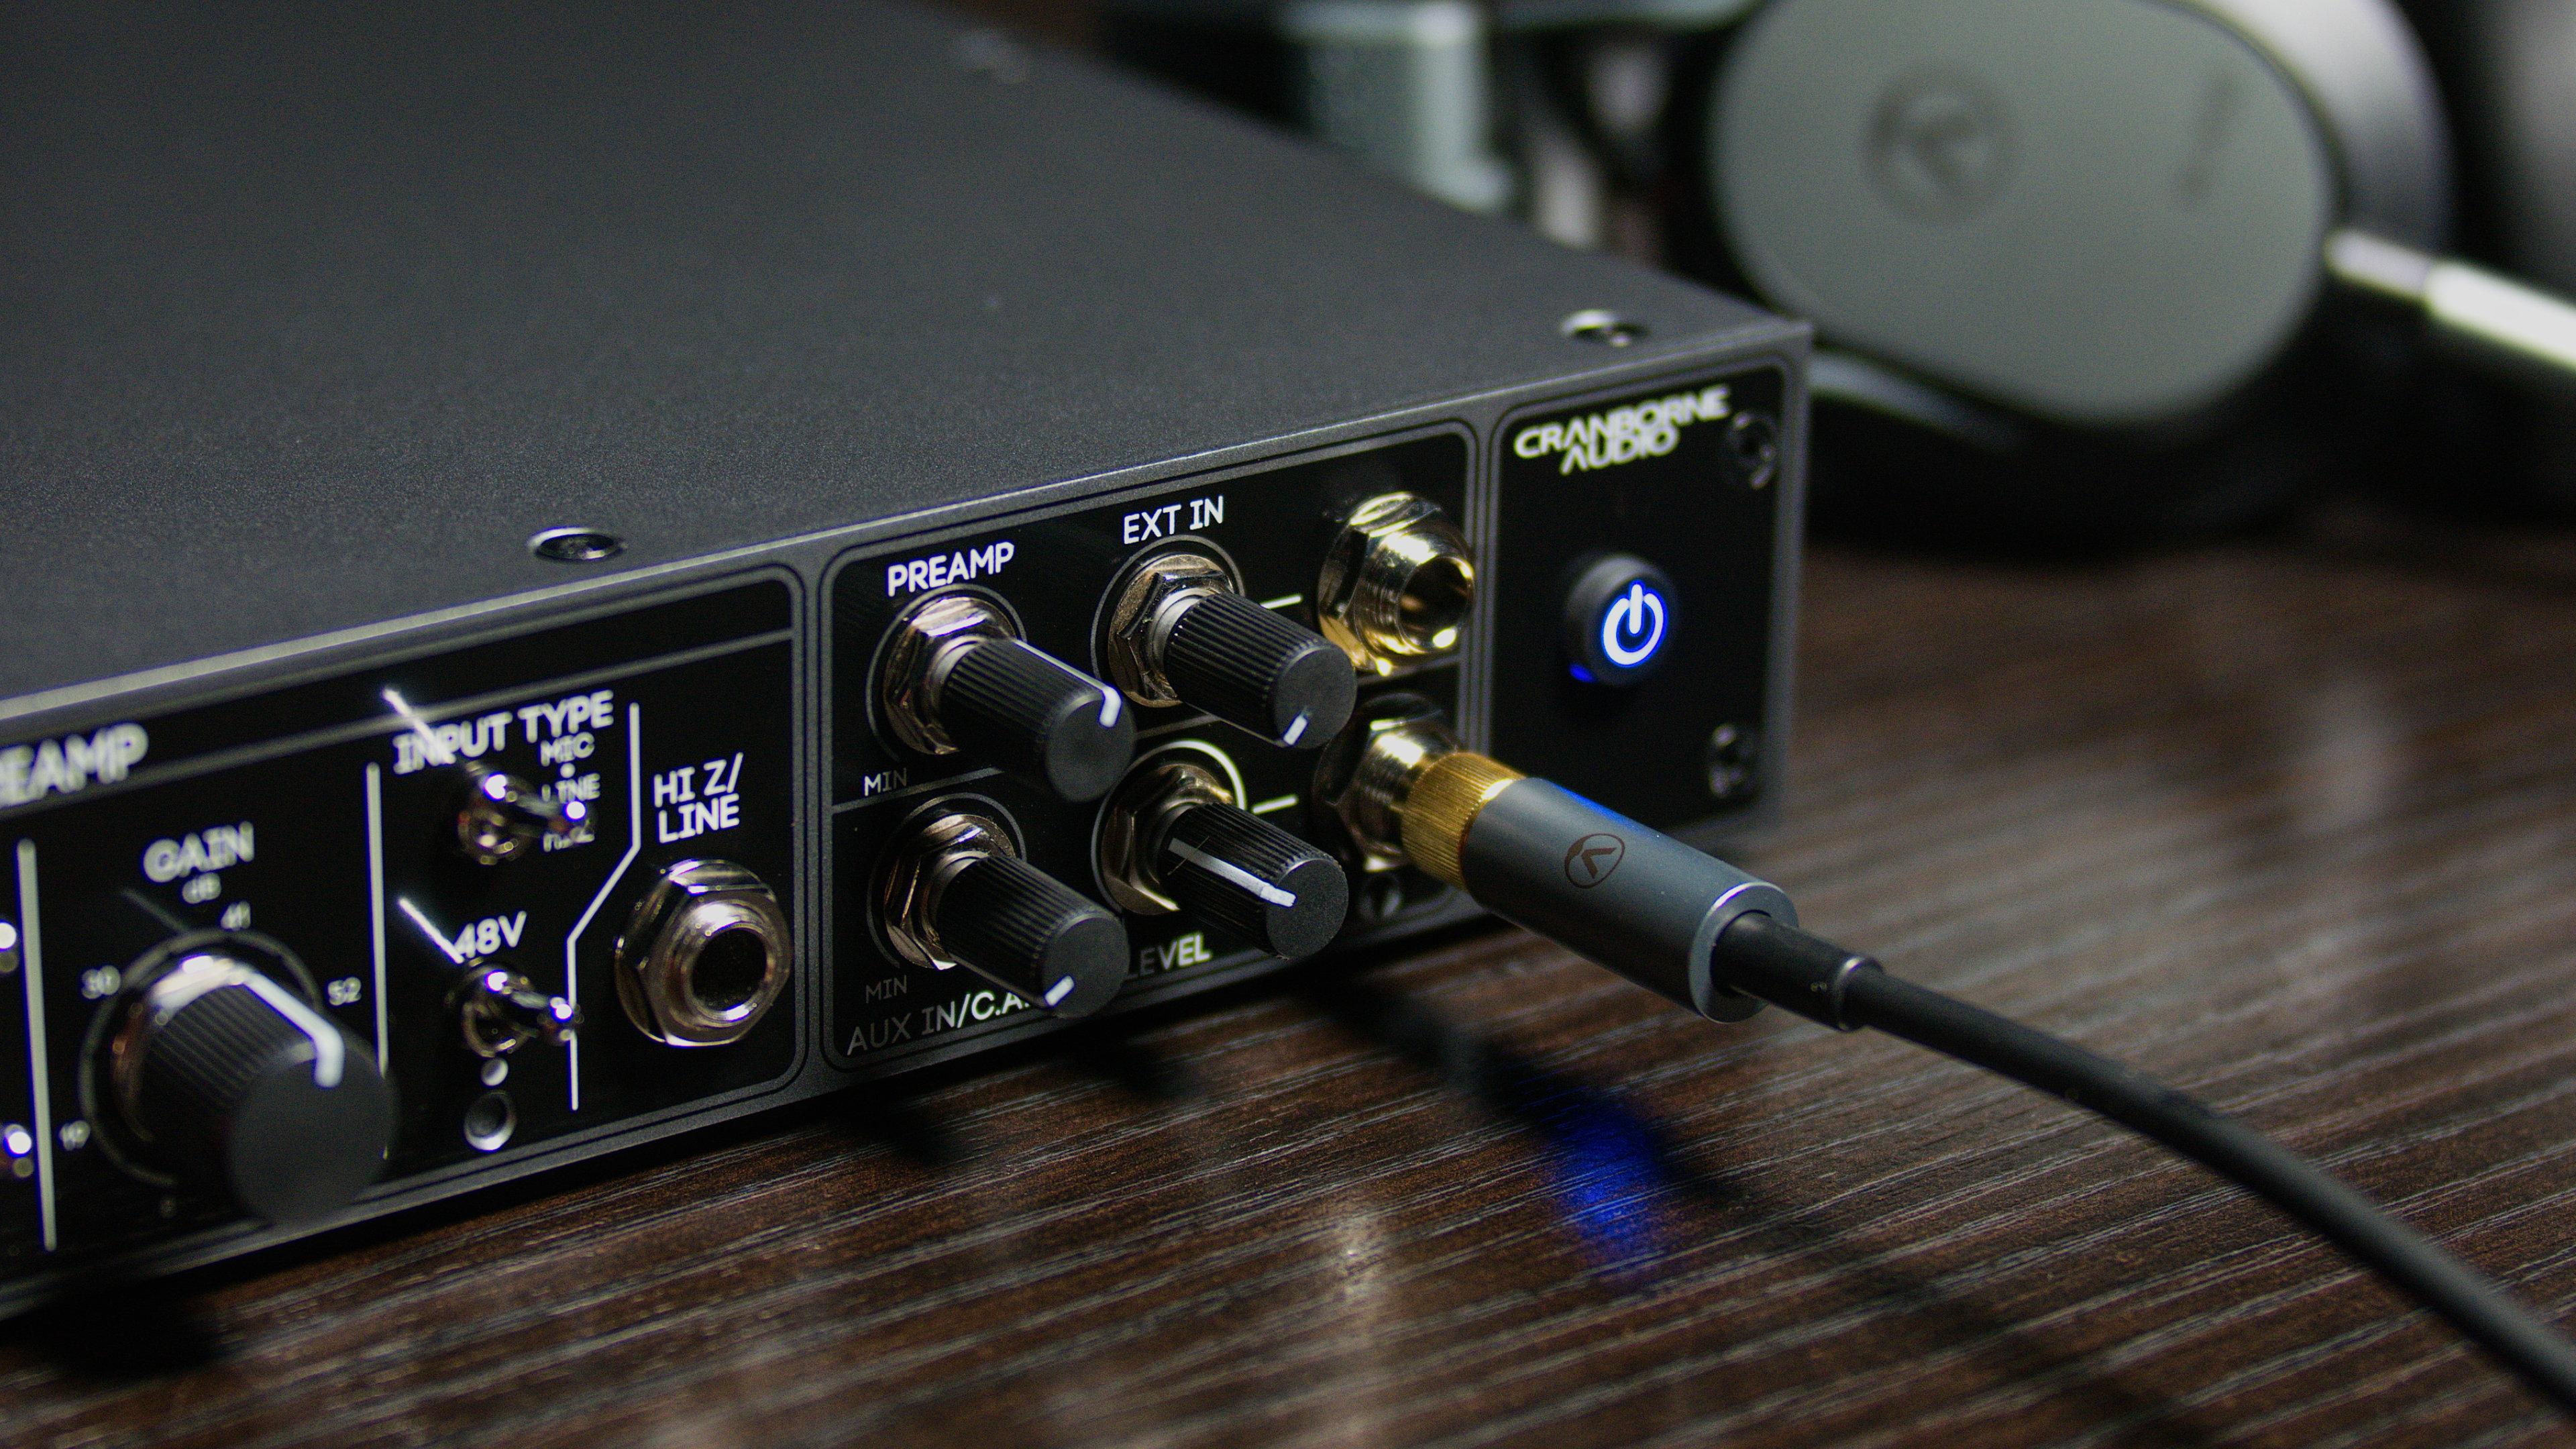 EC1 reference grade headphone amp